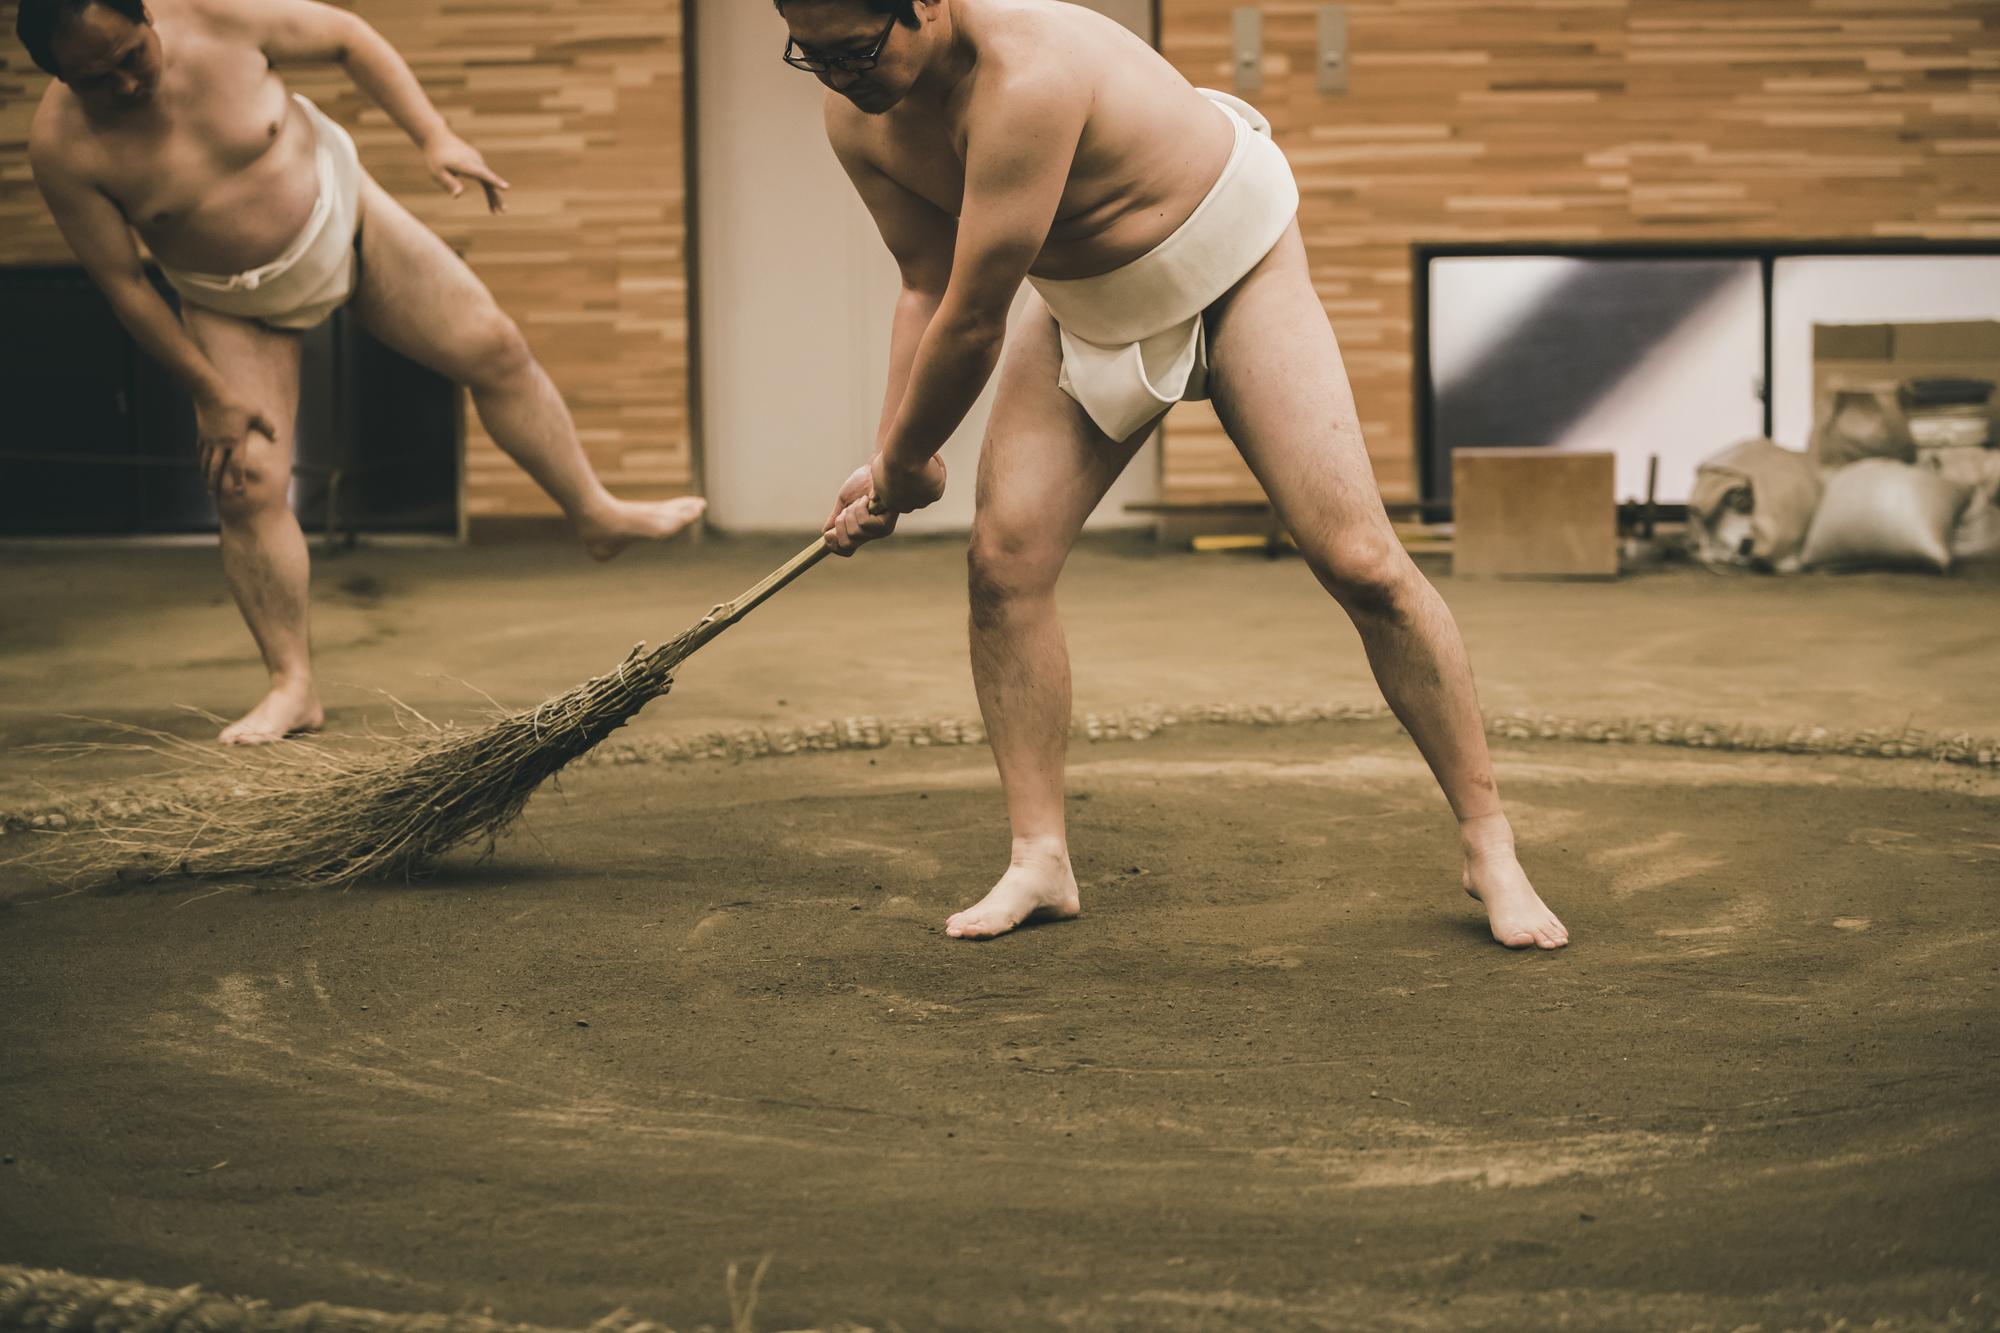 A sumo wrestler sweeping in a sumo beya